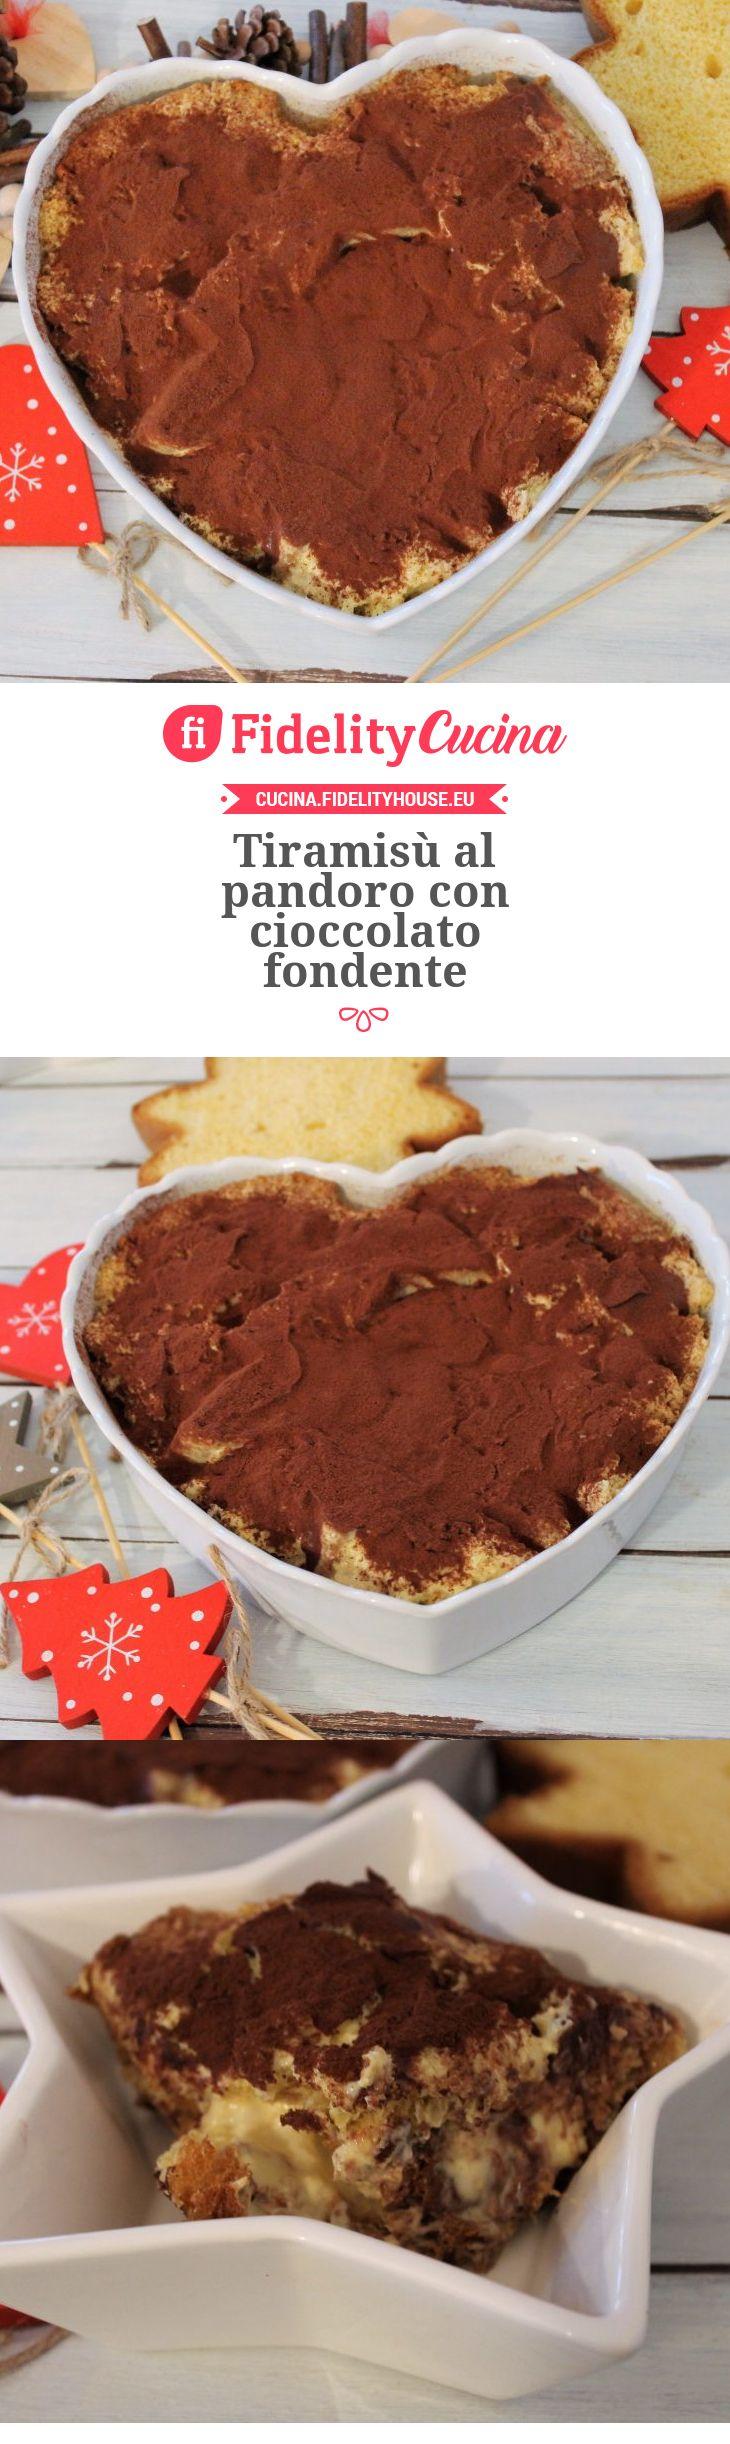 Tiramisù al pandoro con cioccolato fondente